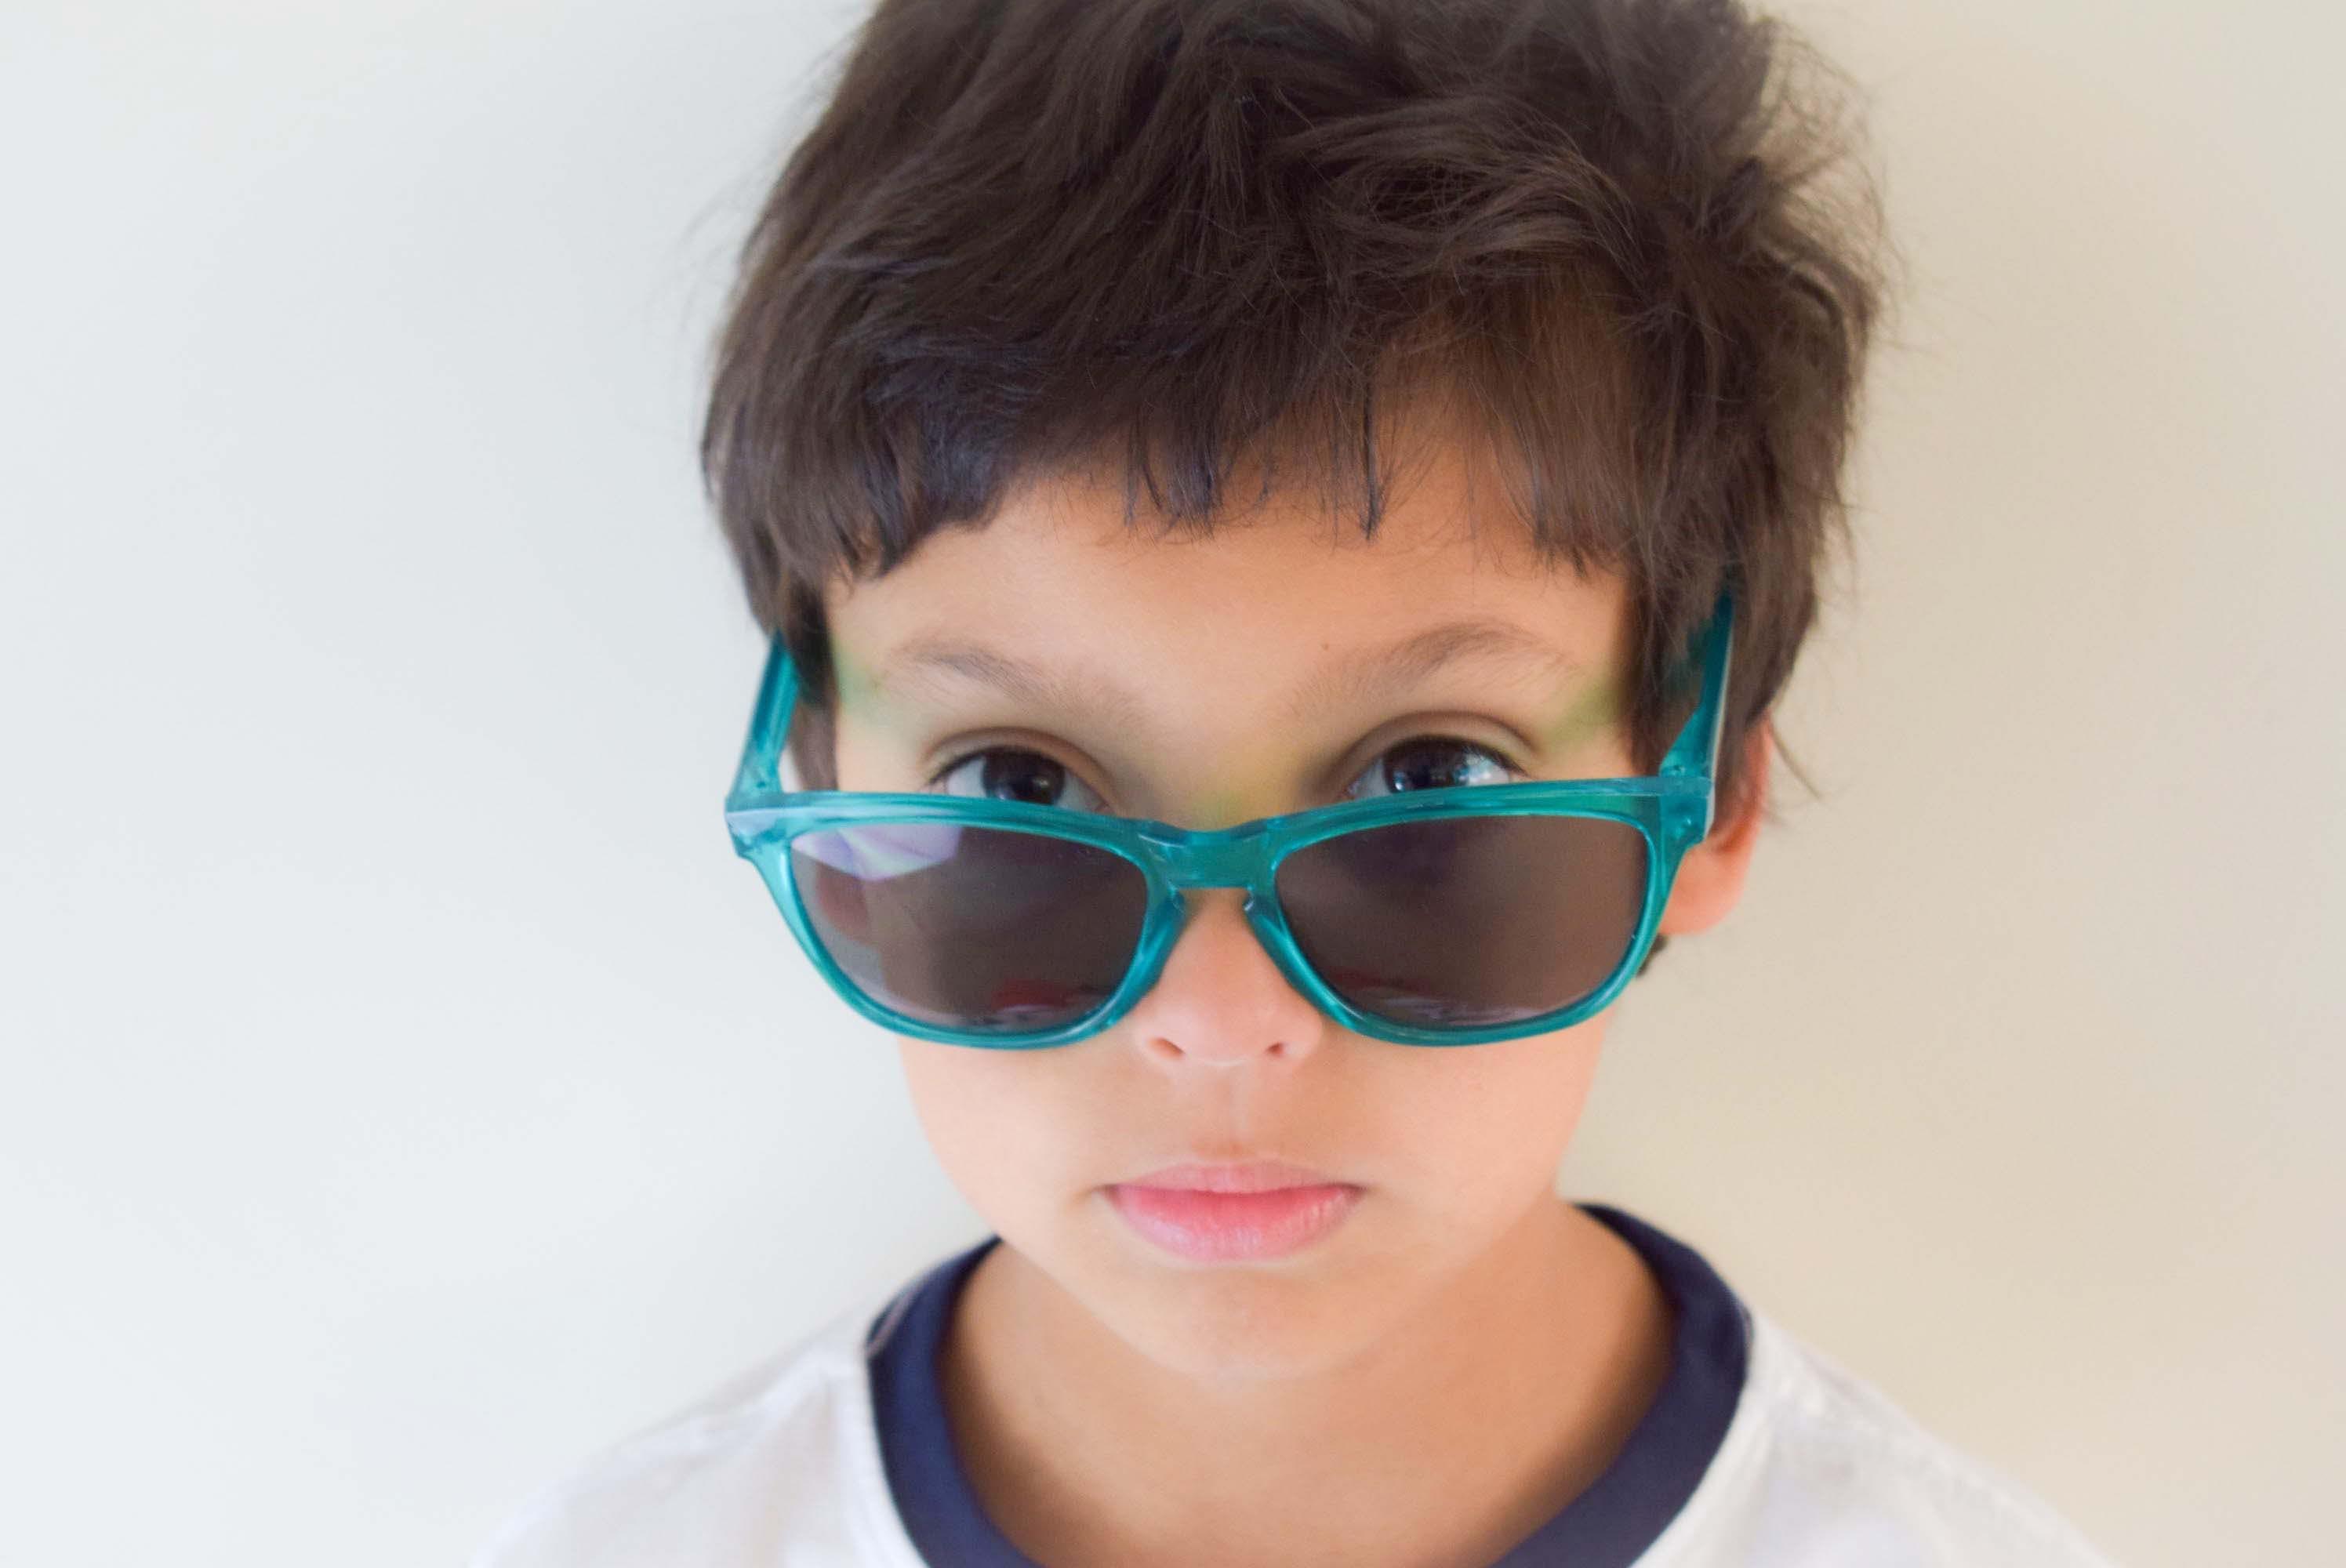 Free stock photo of boy, child, Hispanic boy, latino